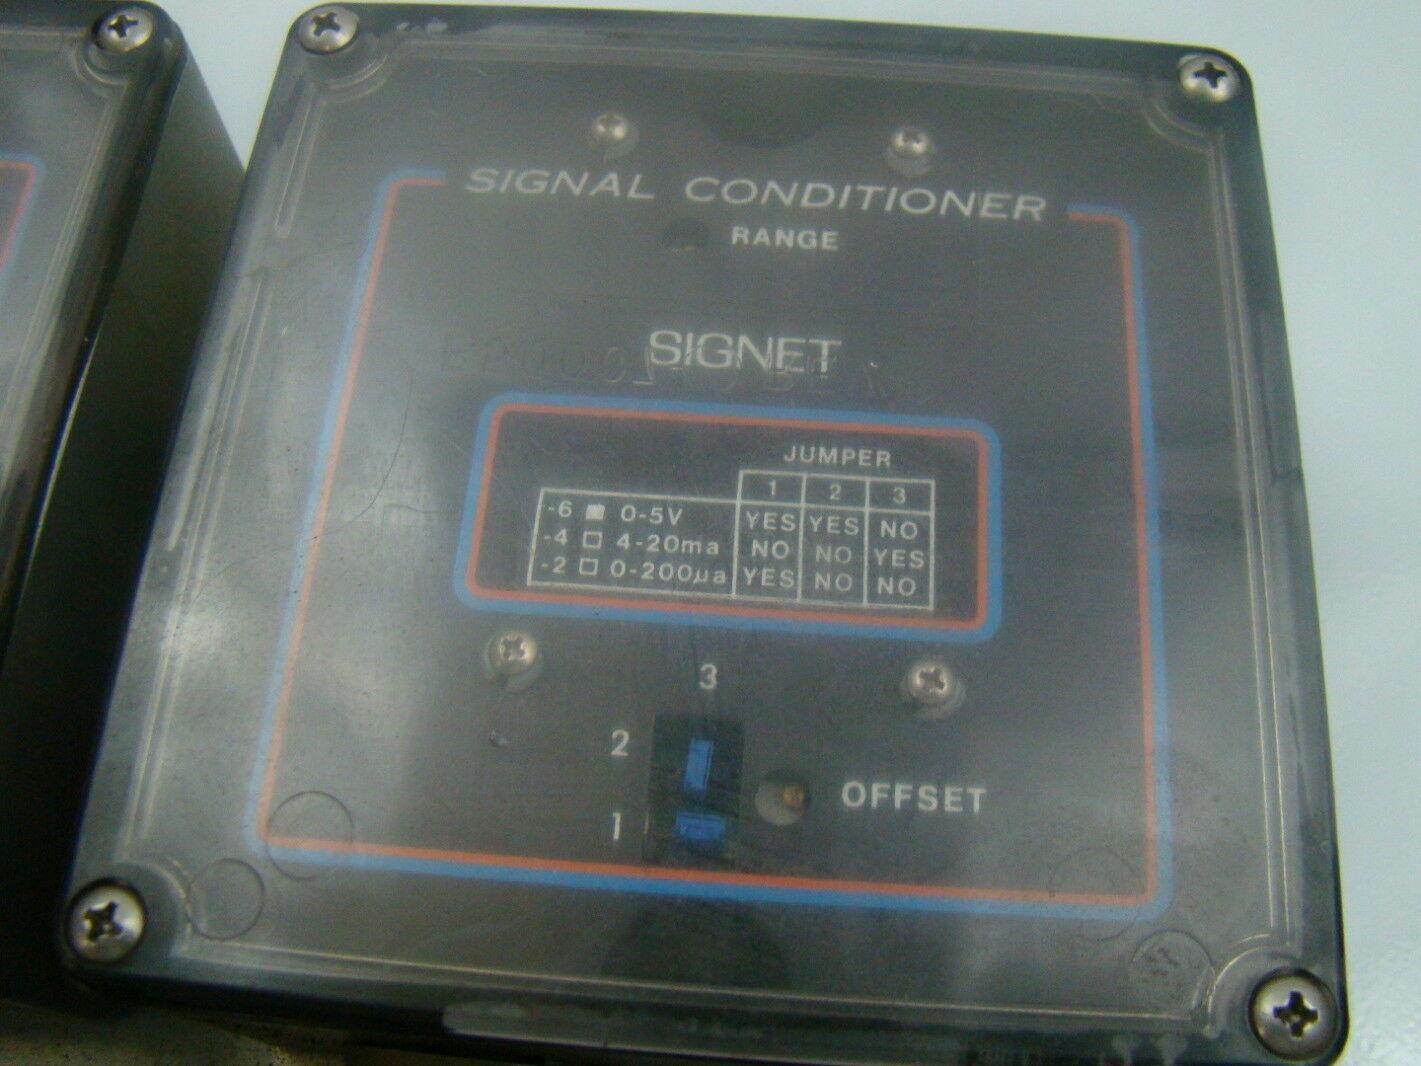 Signet scientific 120v signal conditioner assembly mk514 4 for 120v window air conditioner